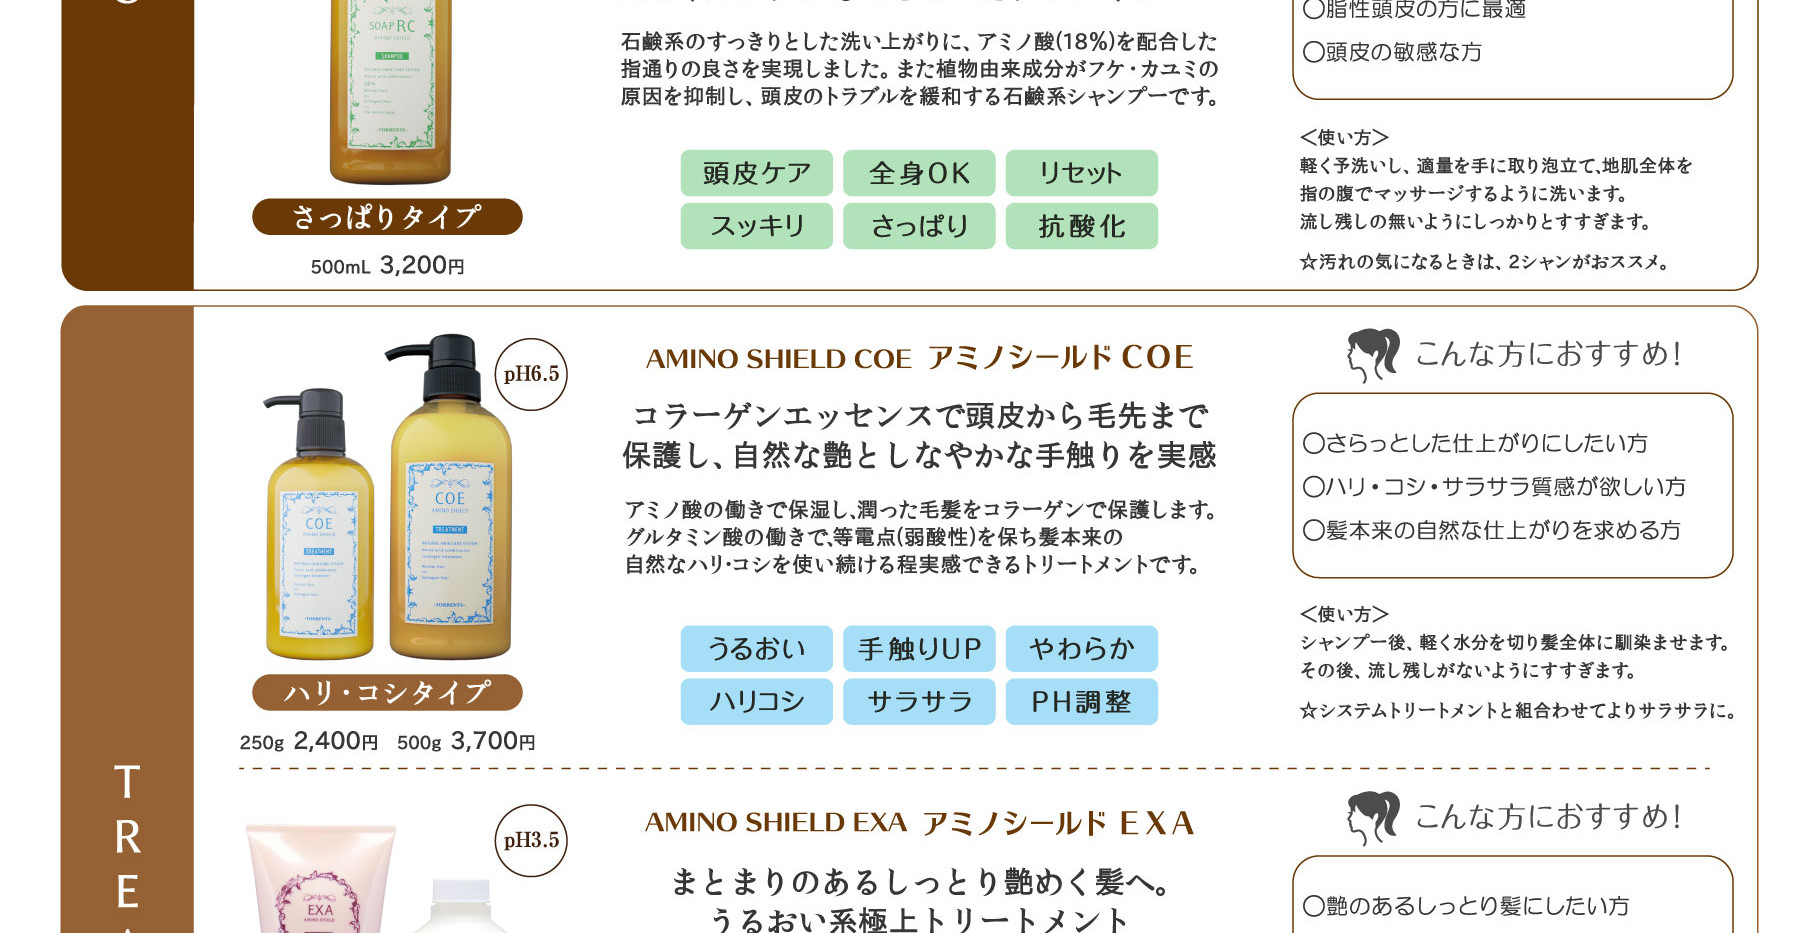 A4両面_SP&TRパンフ_裏_修正済み-.jpg